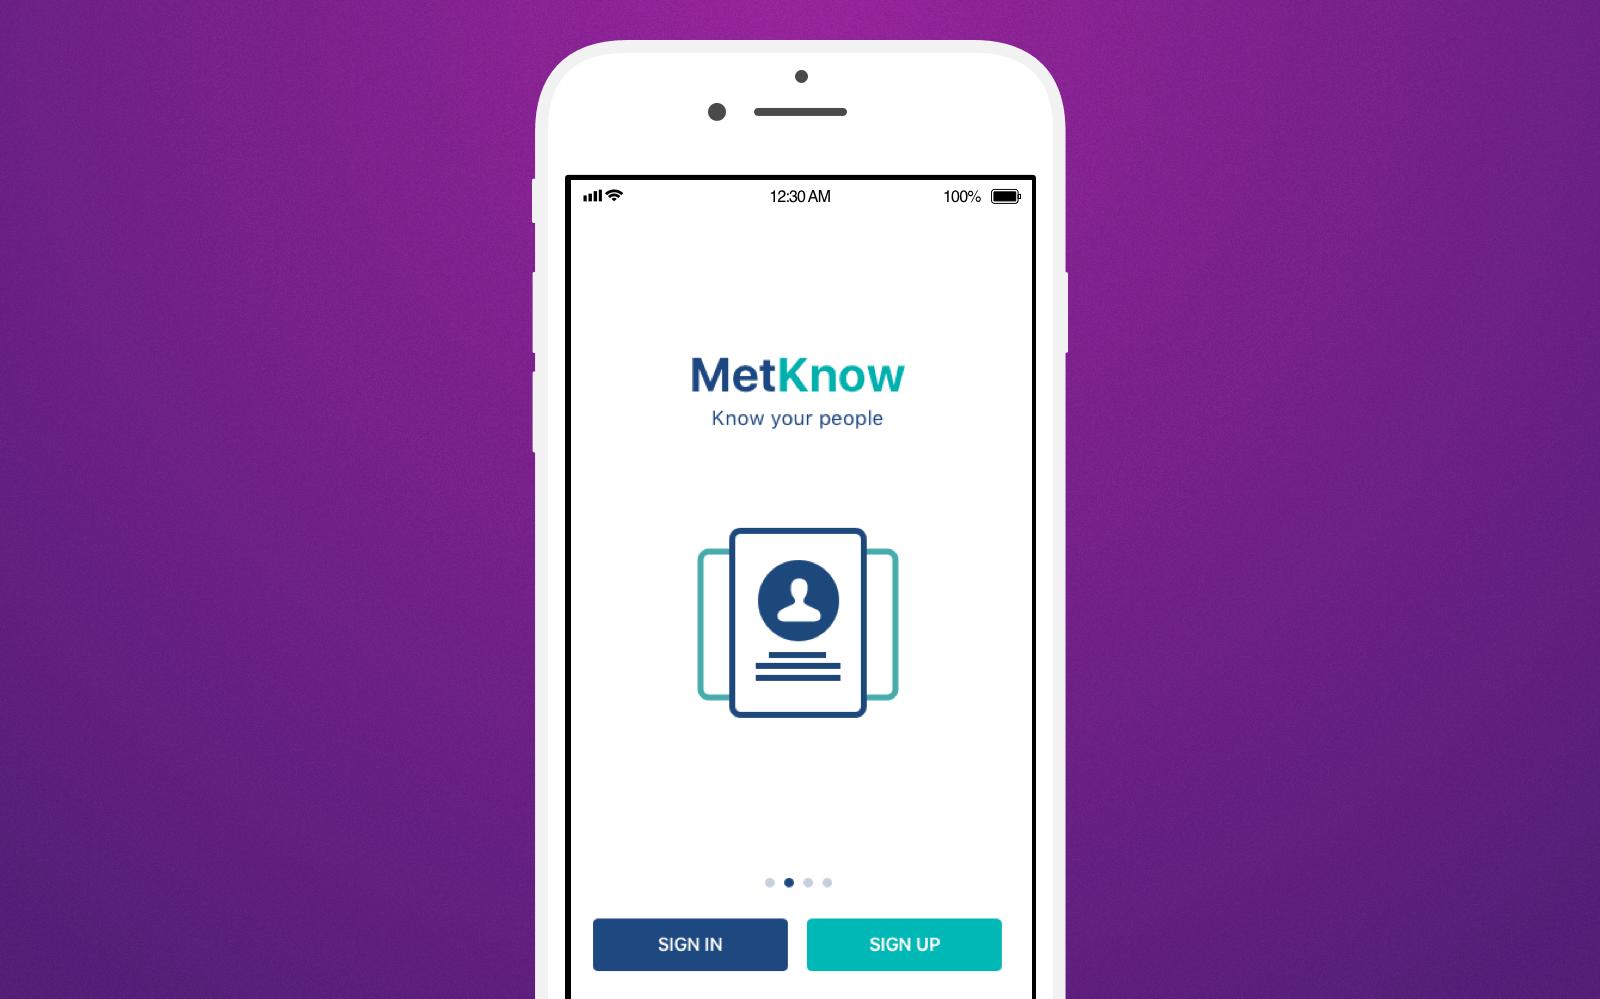 MetKnow app page